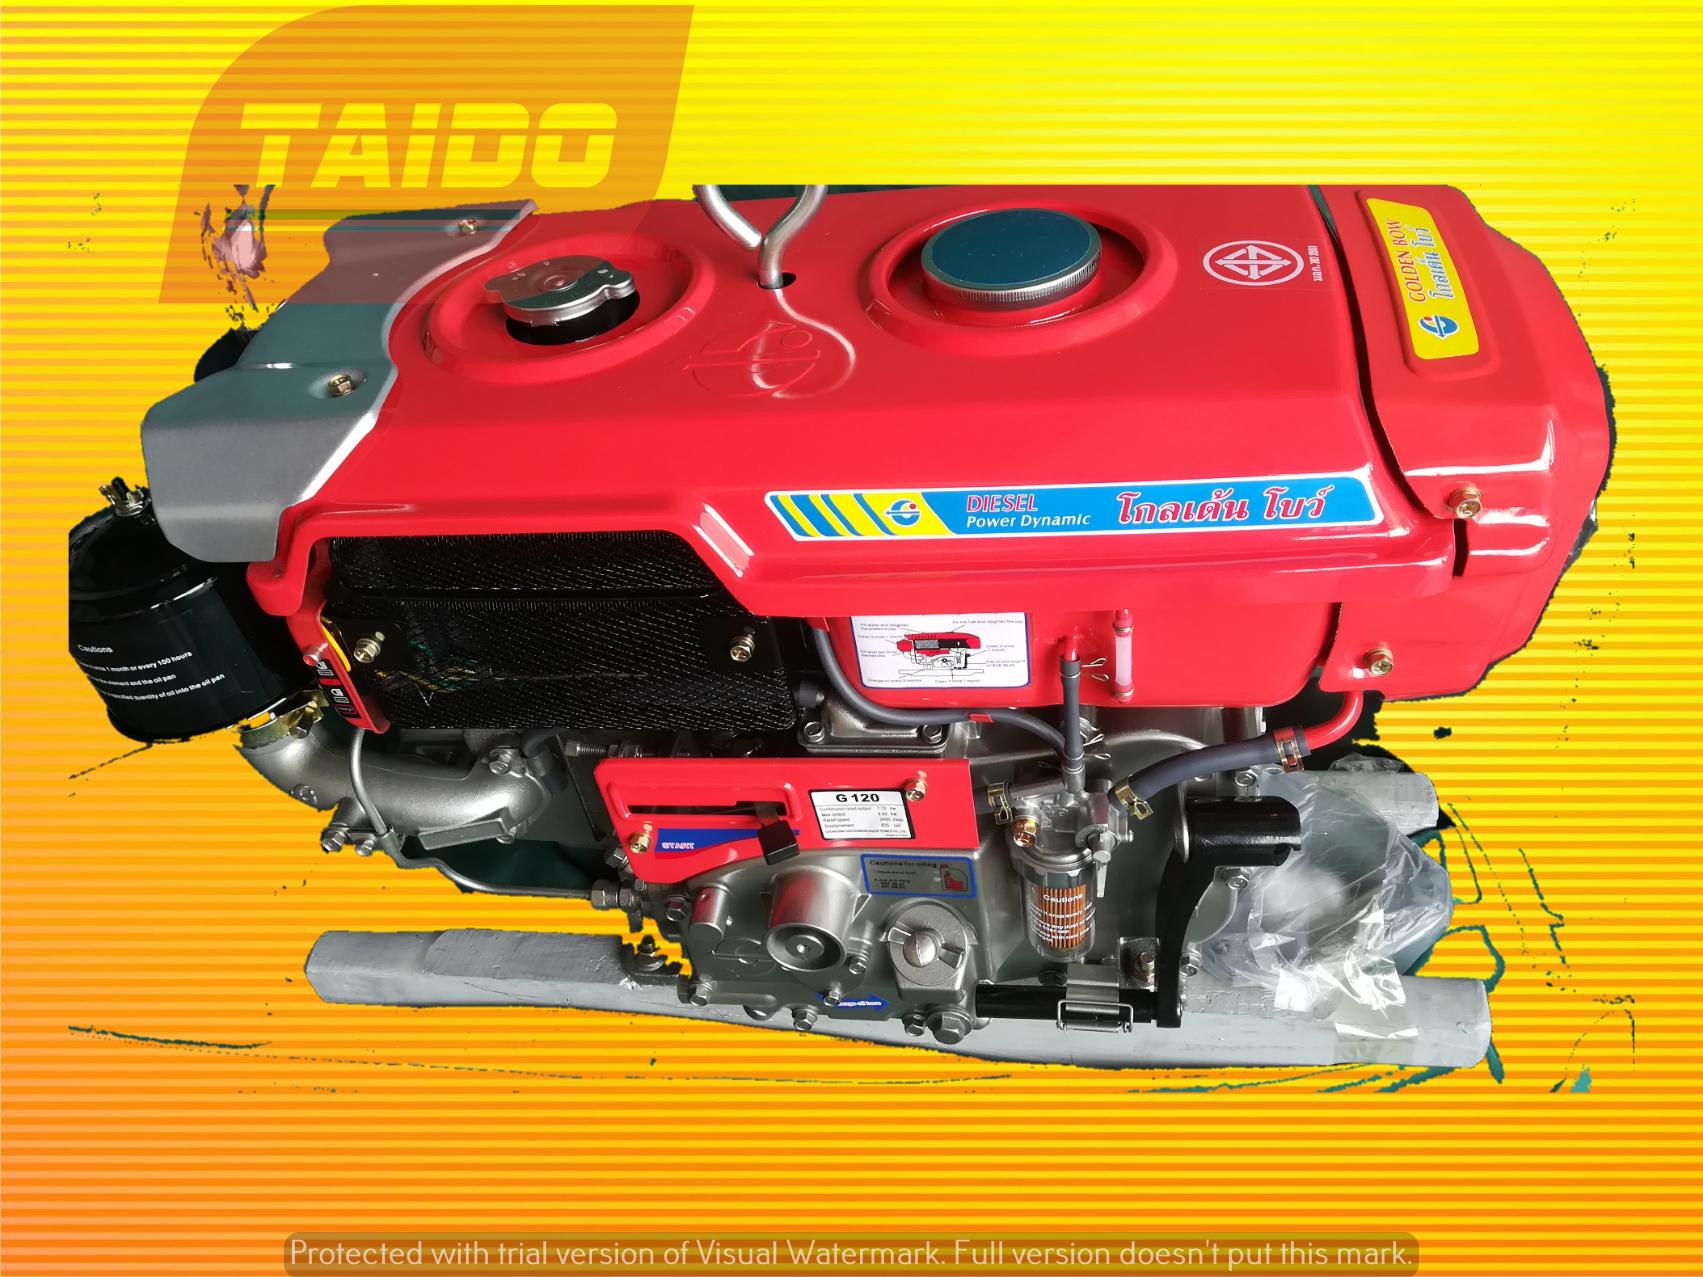 Golden Bow G120 Diesel Engine 12HP Diesel Engine Penang Malaysia